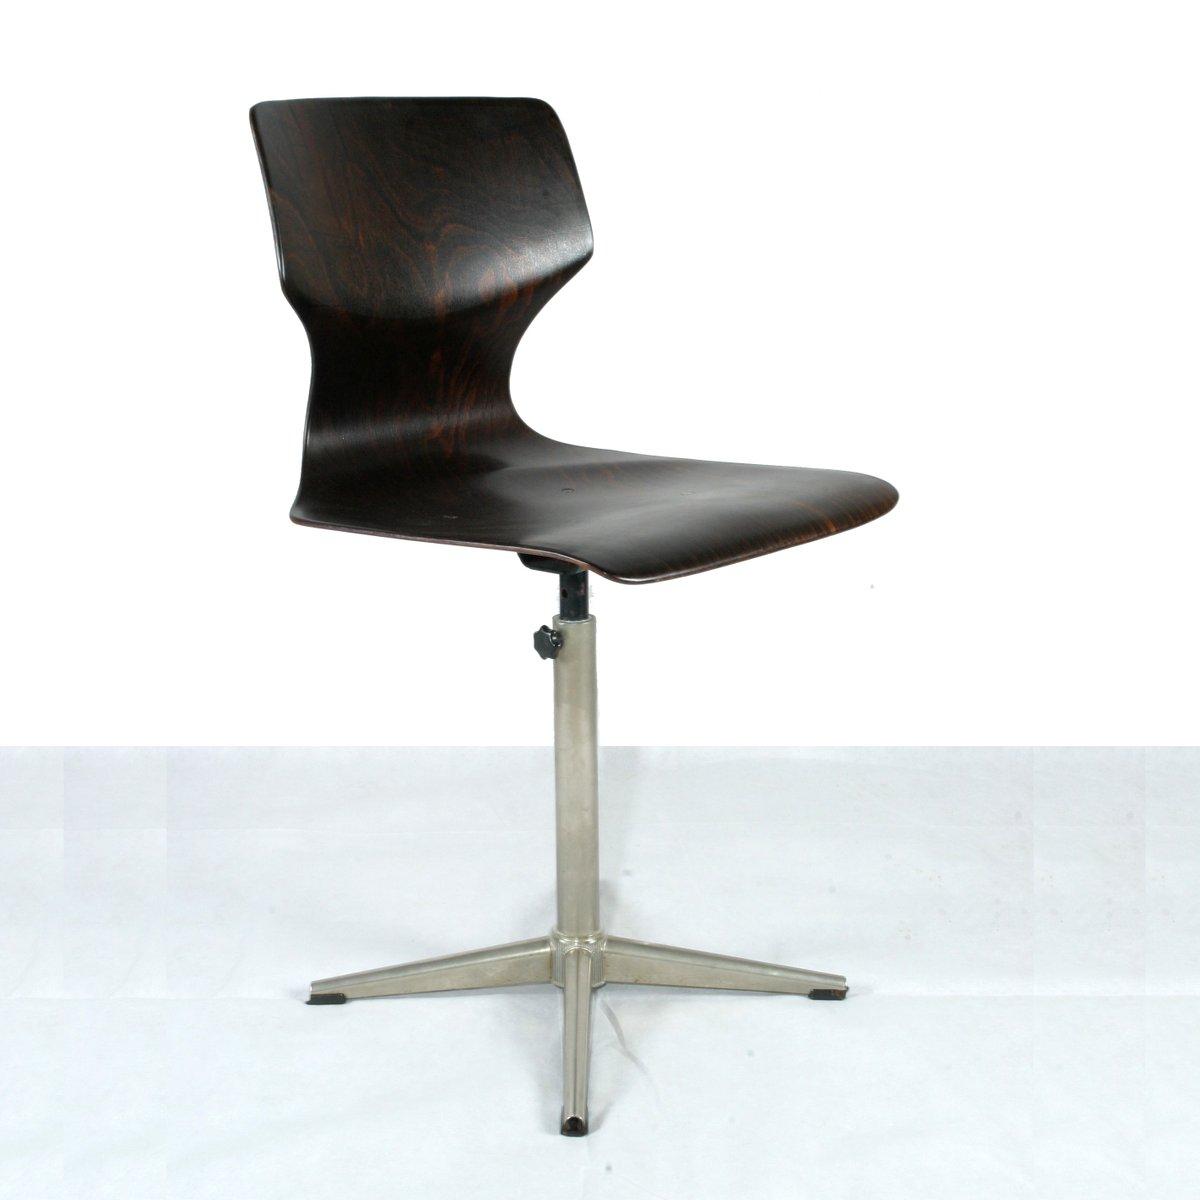 vintage stuhl von pagholz fl totto bei pamono kaufen. Black Bedroom Furniture Sets. Home Design Ideas